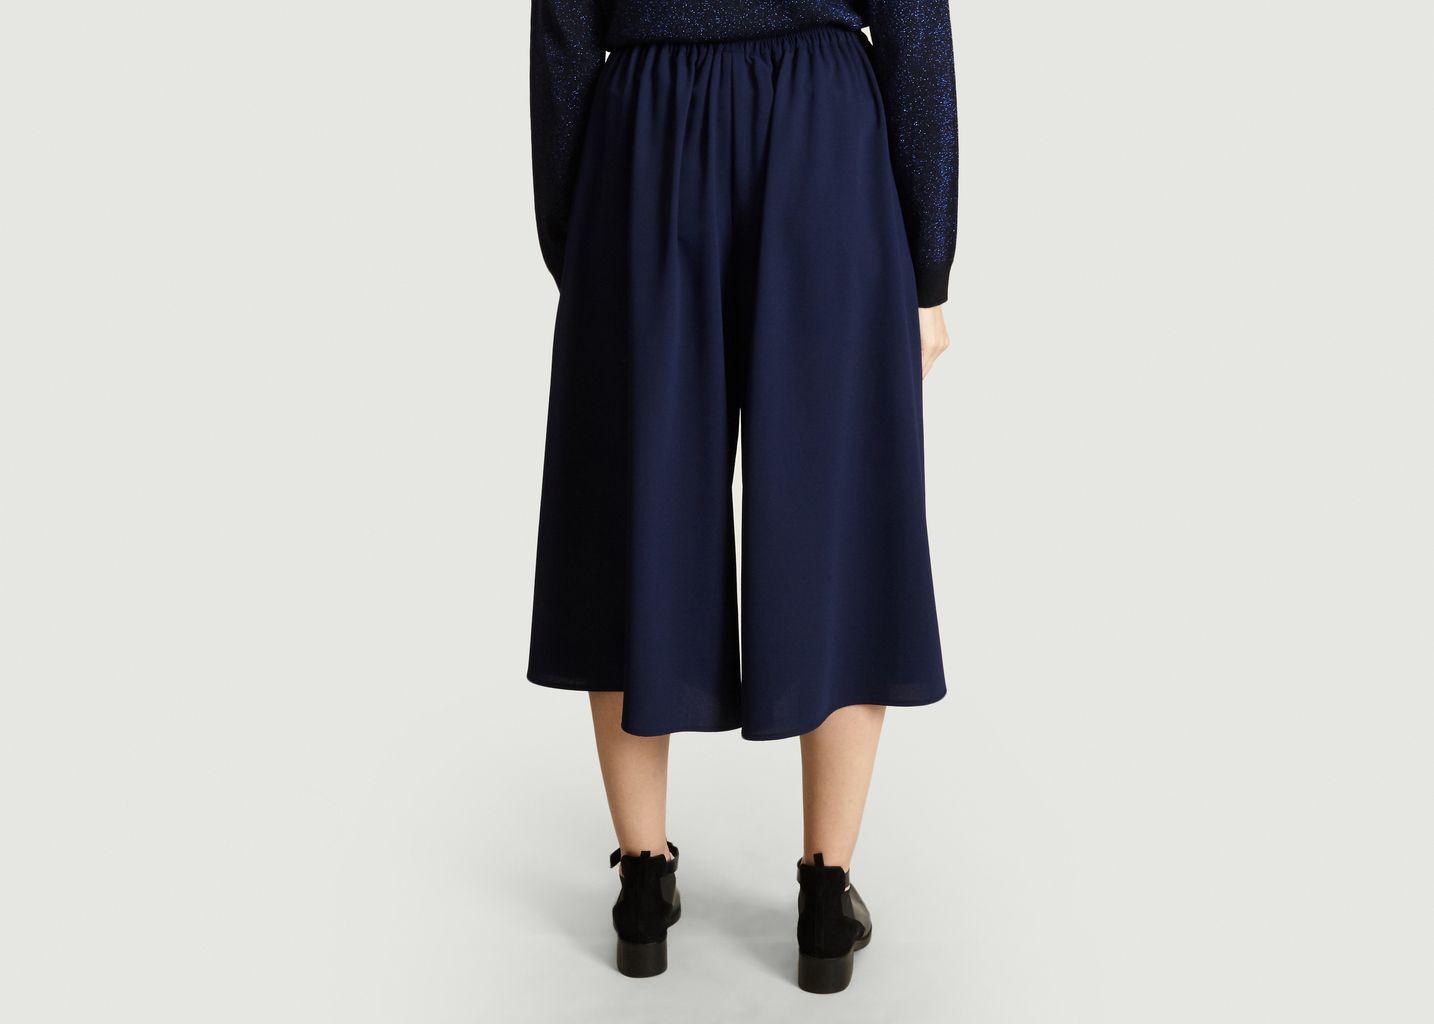 Pantalon Jupe Culotte - See by Chloé